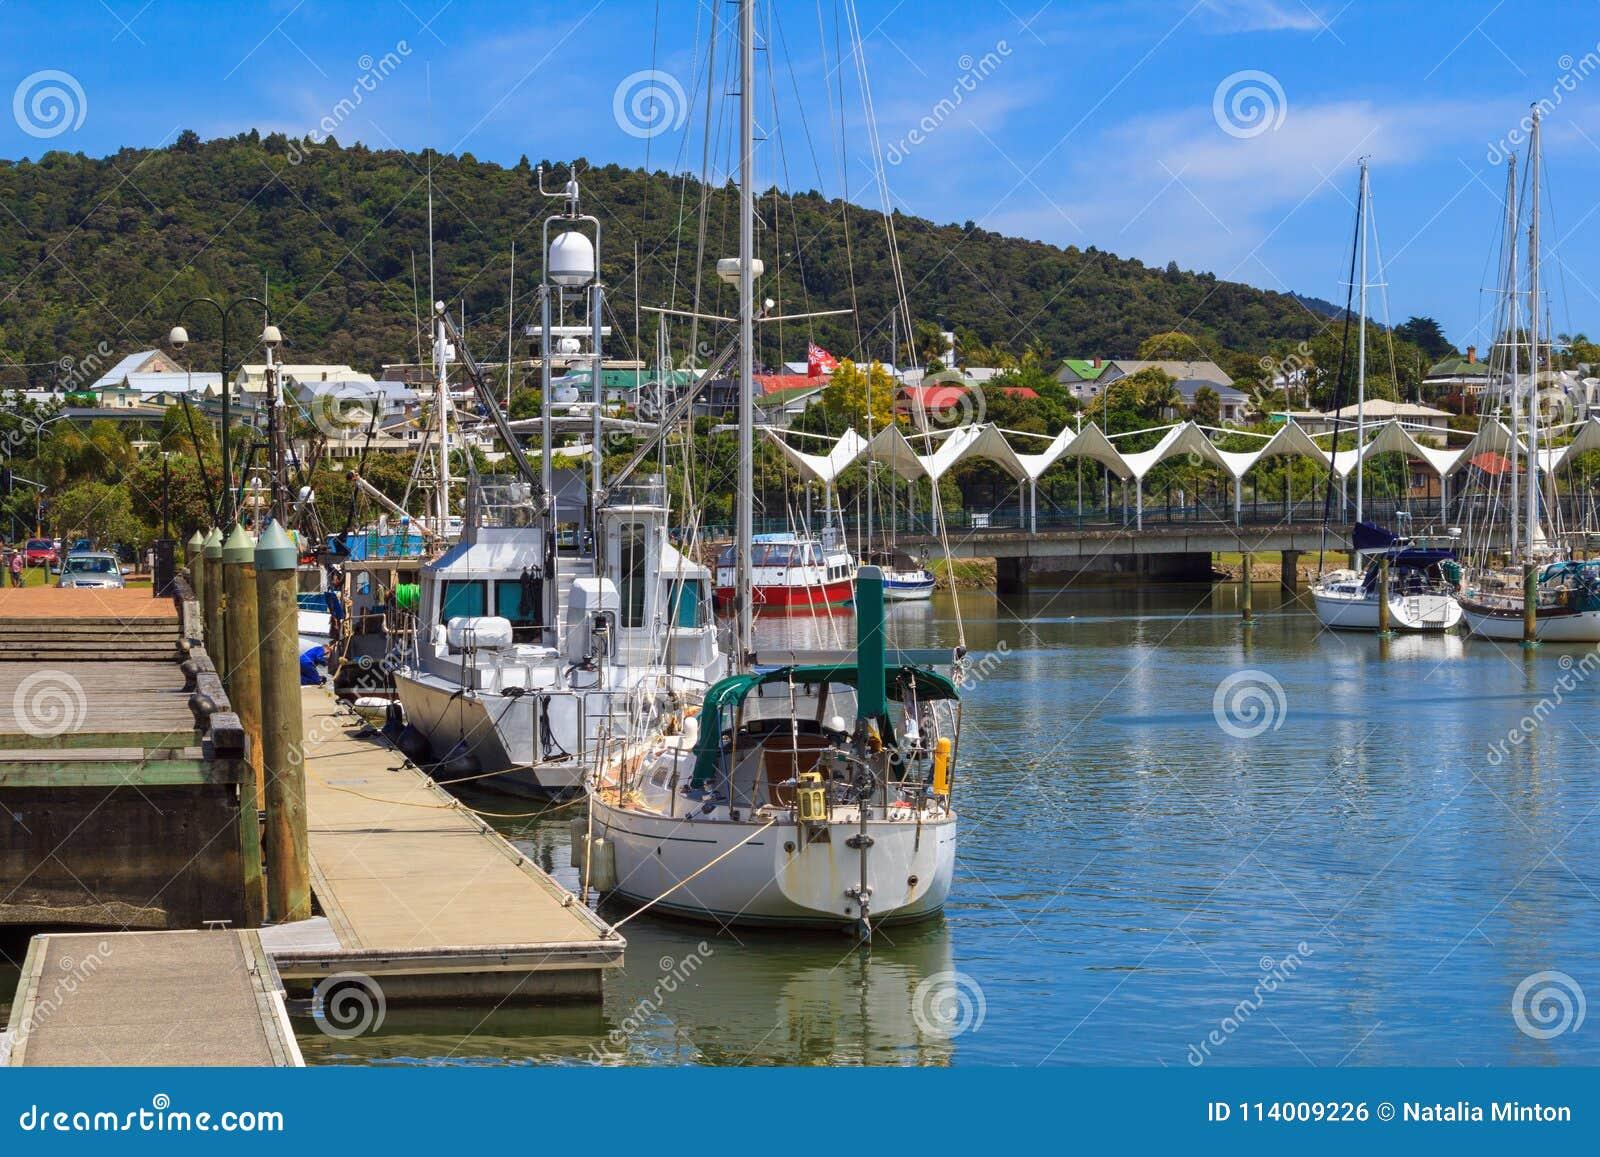 Whangarei Marina In Summer Day Stock Photo - Image of